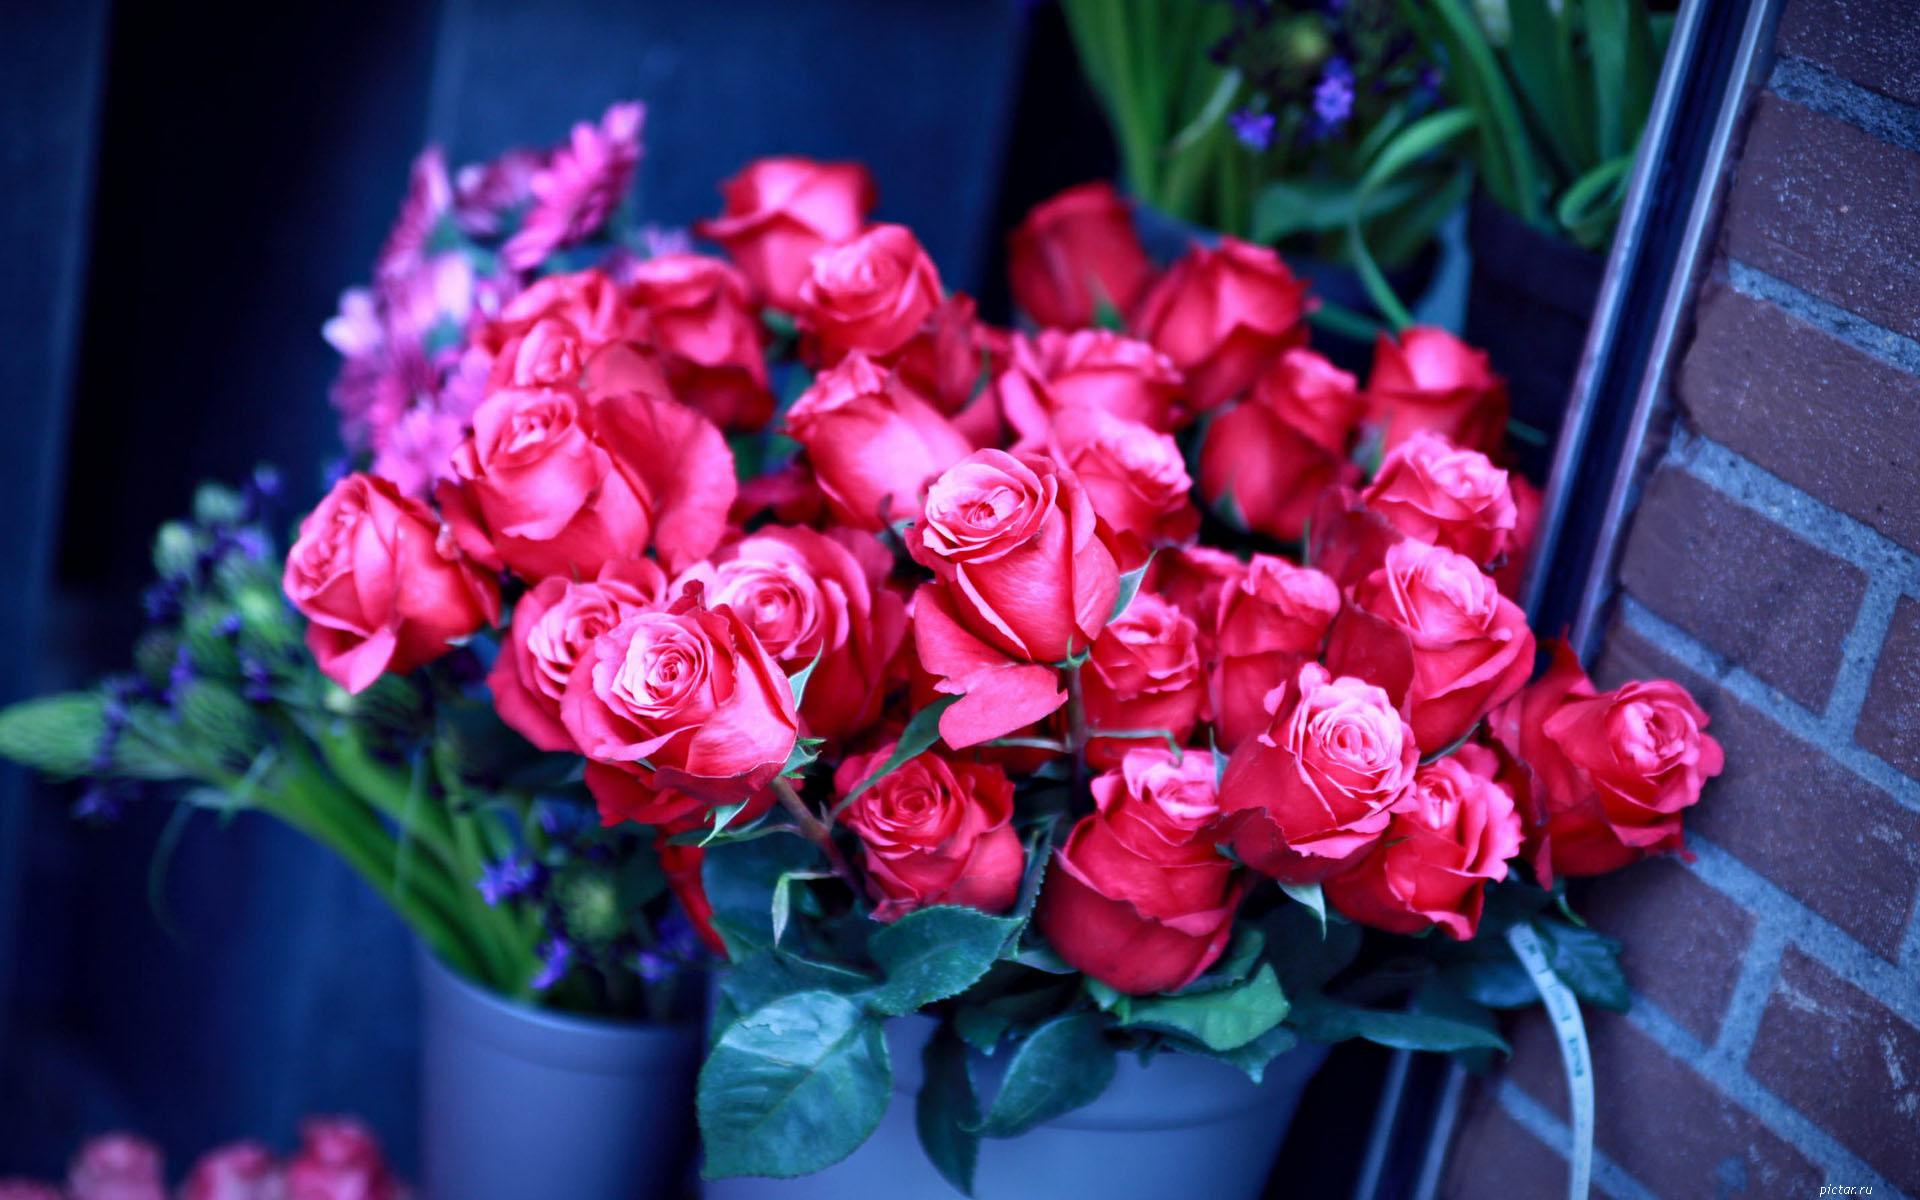 Картинка с розами для девушки